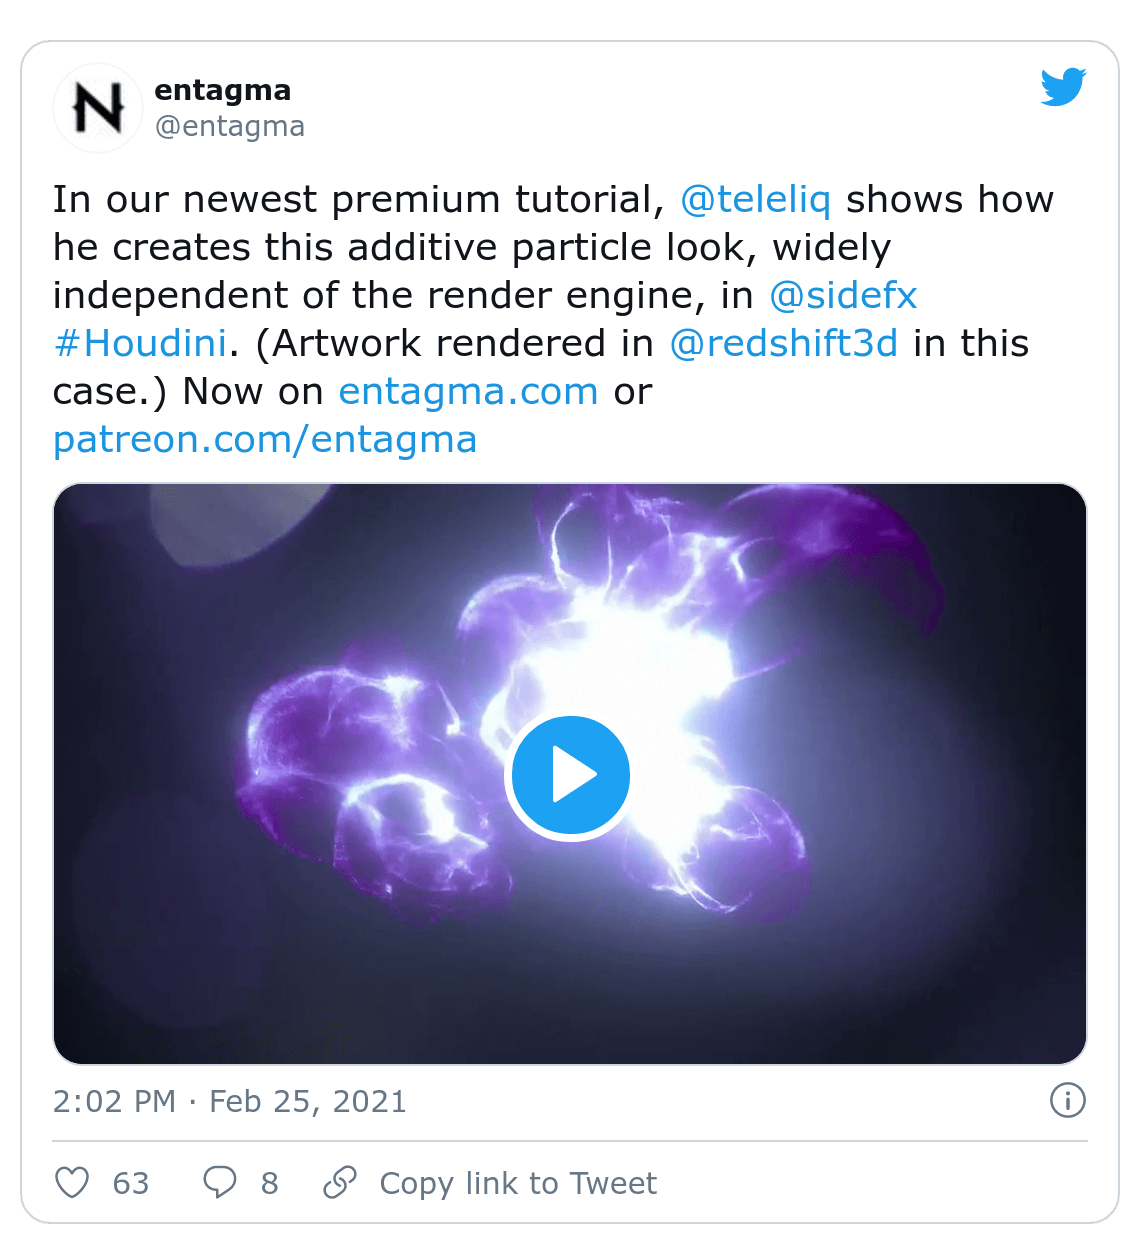 Screenshot of Entagma tweet about Houdini tutorial